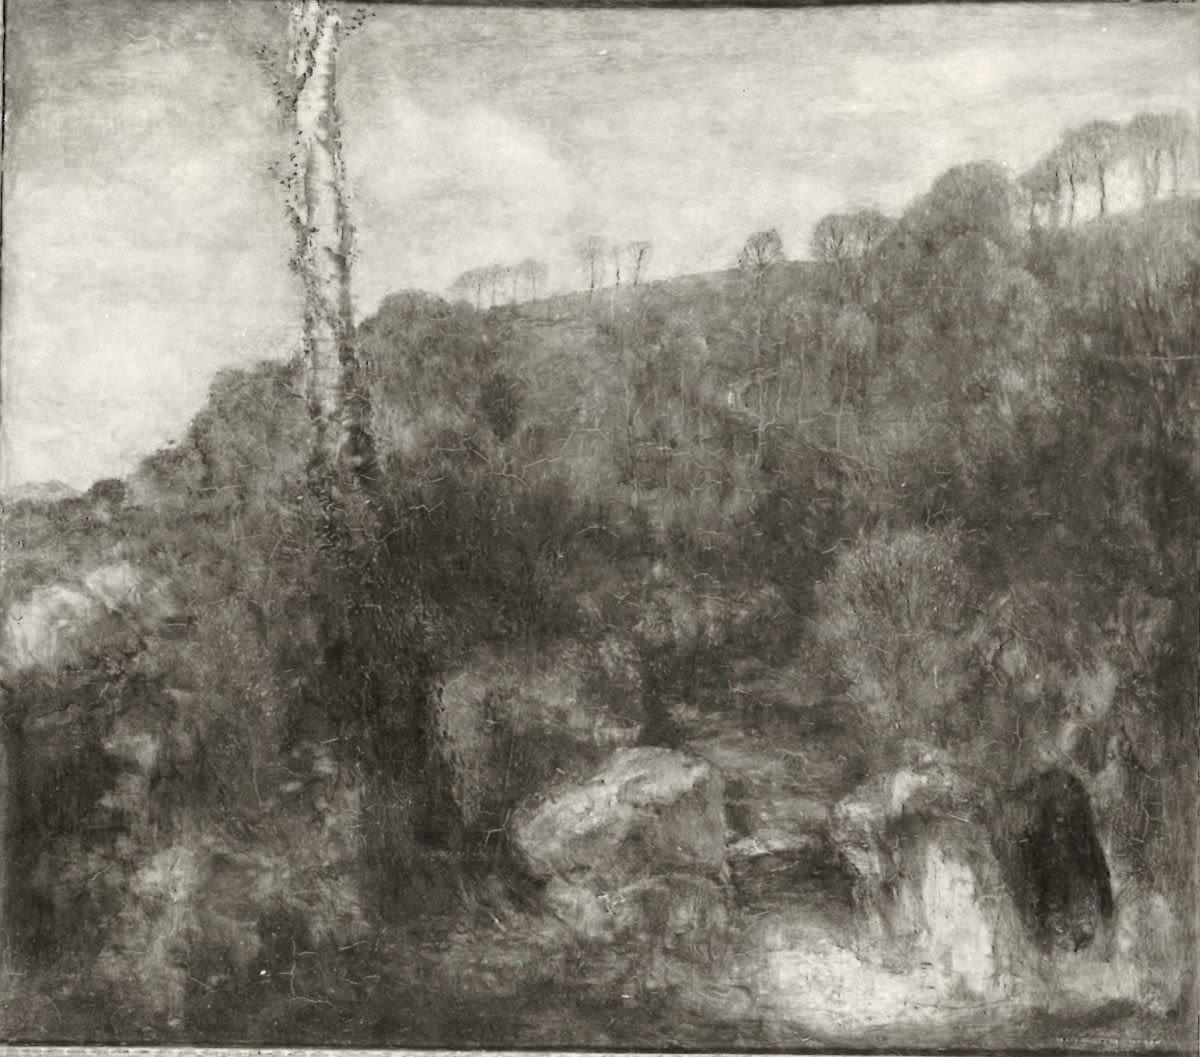 Umbrische Landschaft